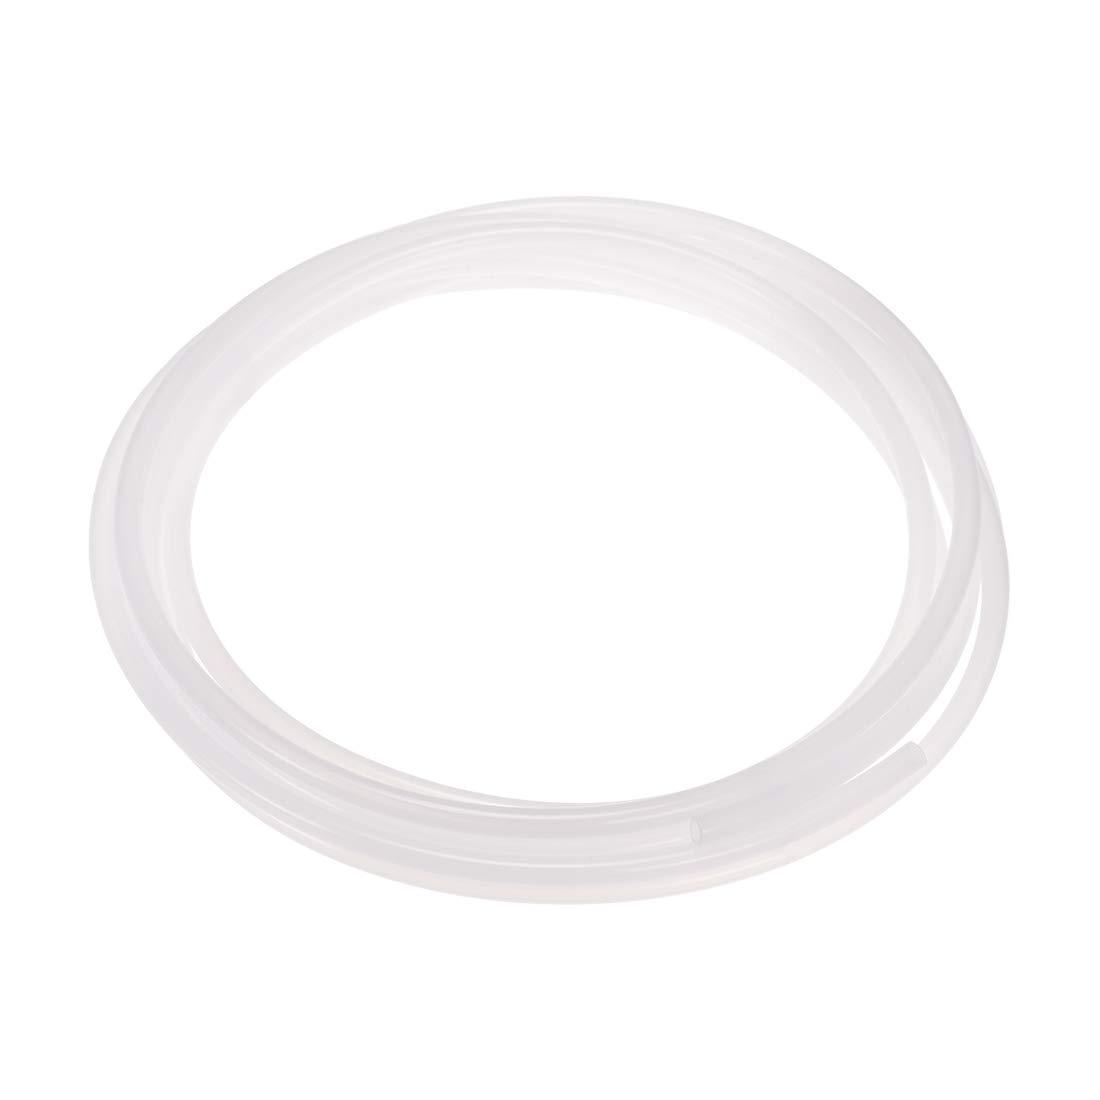 uxcell PE Plastic Tubing, 23/64 Inch ID x 15/32 Inch OD, 13.1 Feet Length, White